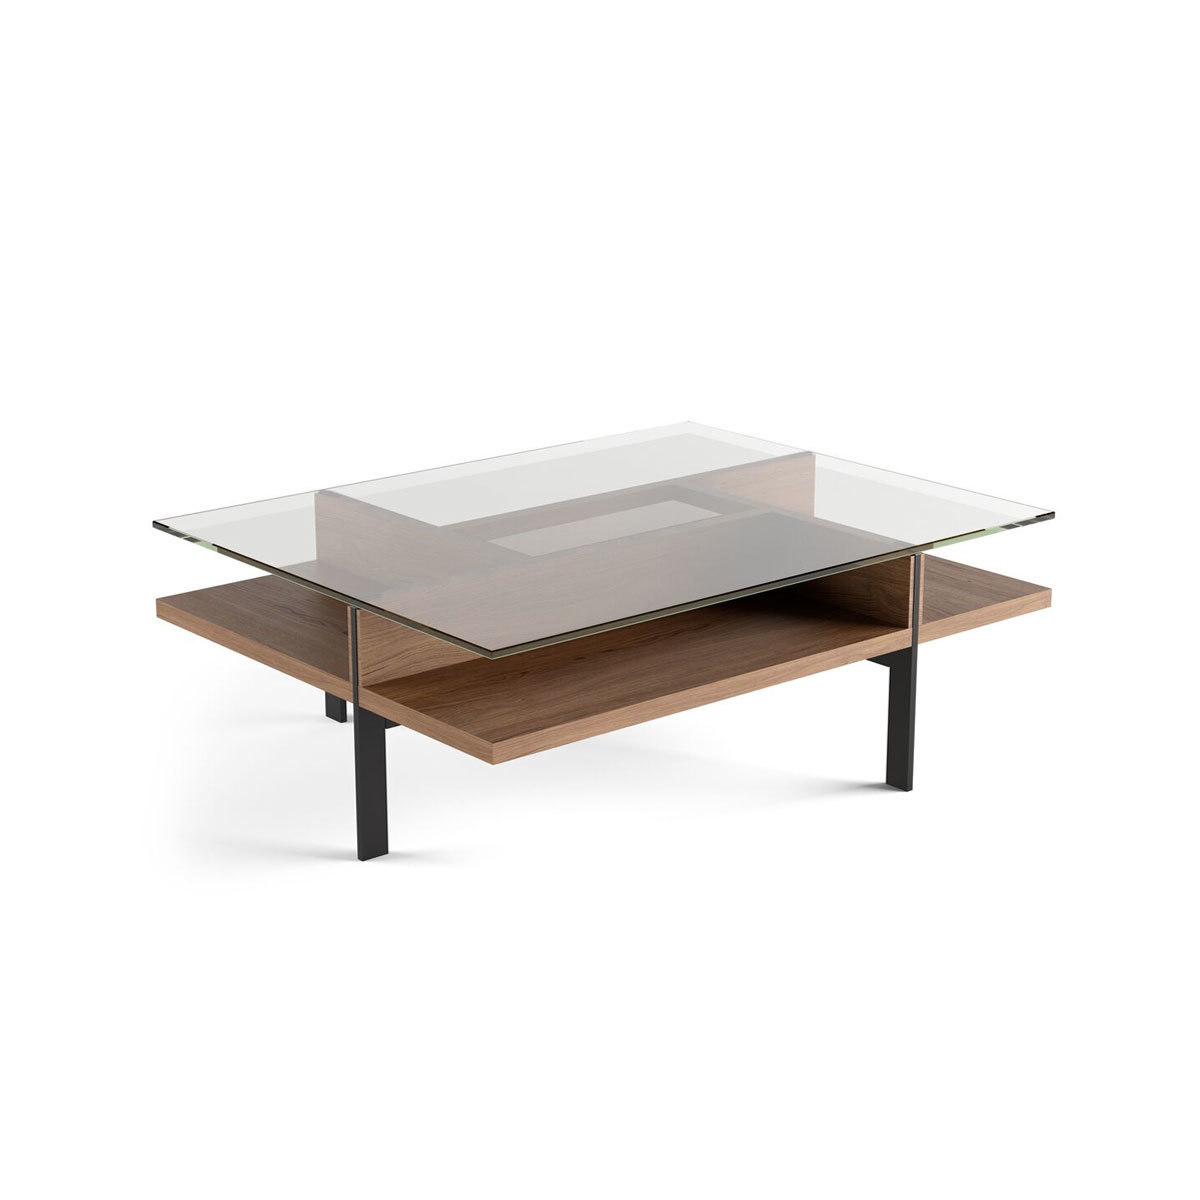 Rectangular Coffee Table: Terrace Rectangular Coffee Table 1152